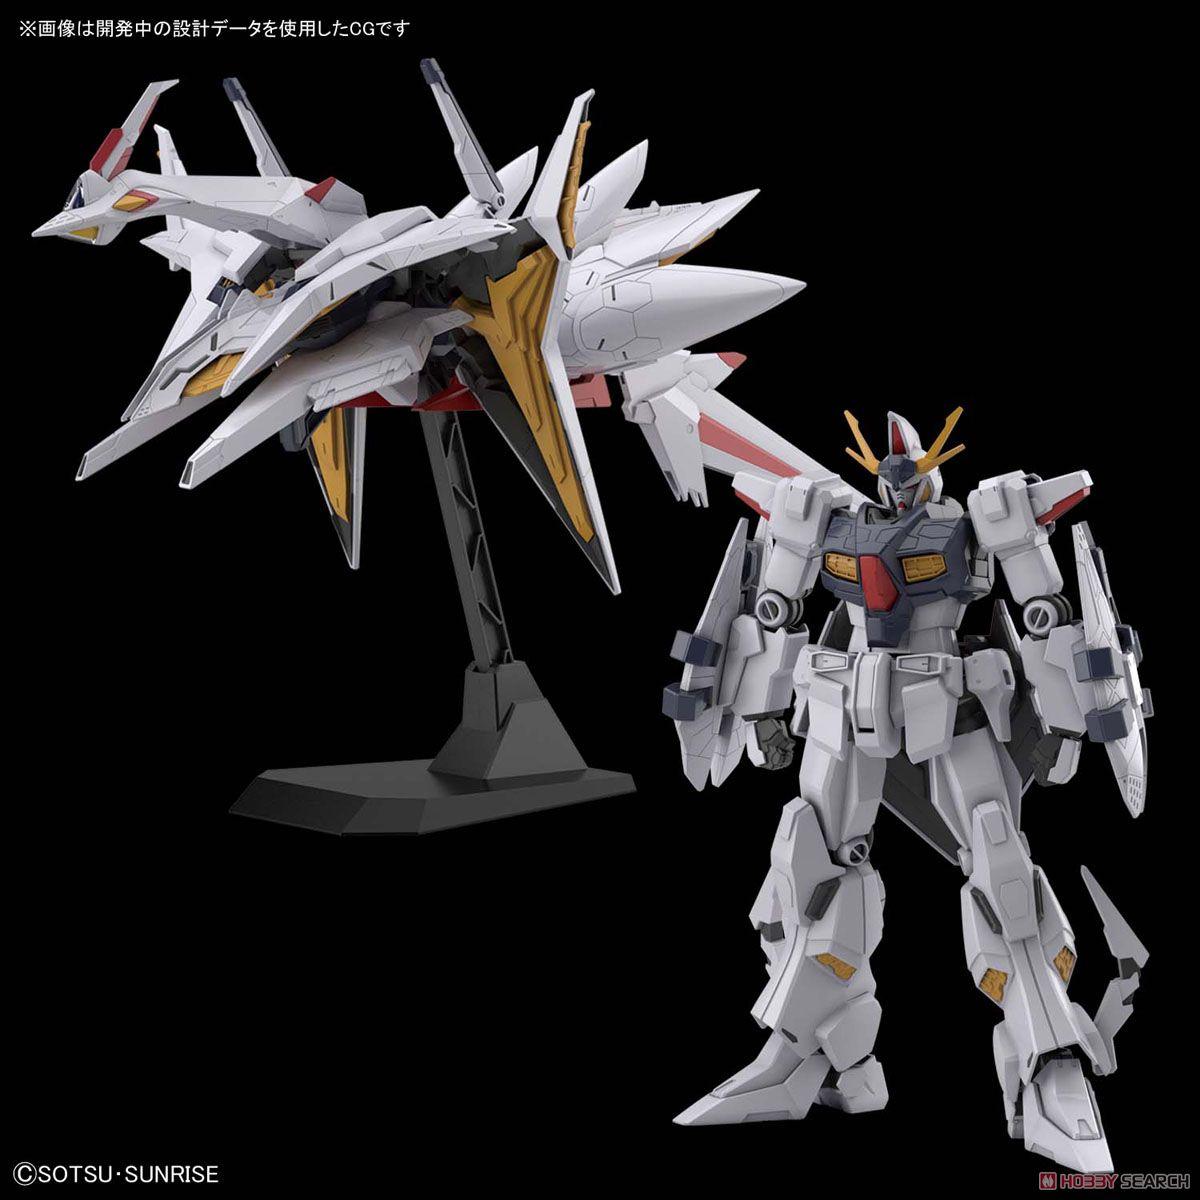 HGUC 1/144『ペーネロペー』機動戦士ガンダム 閃光のハサウェイ プラモデル-015